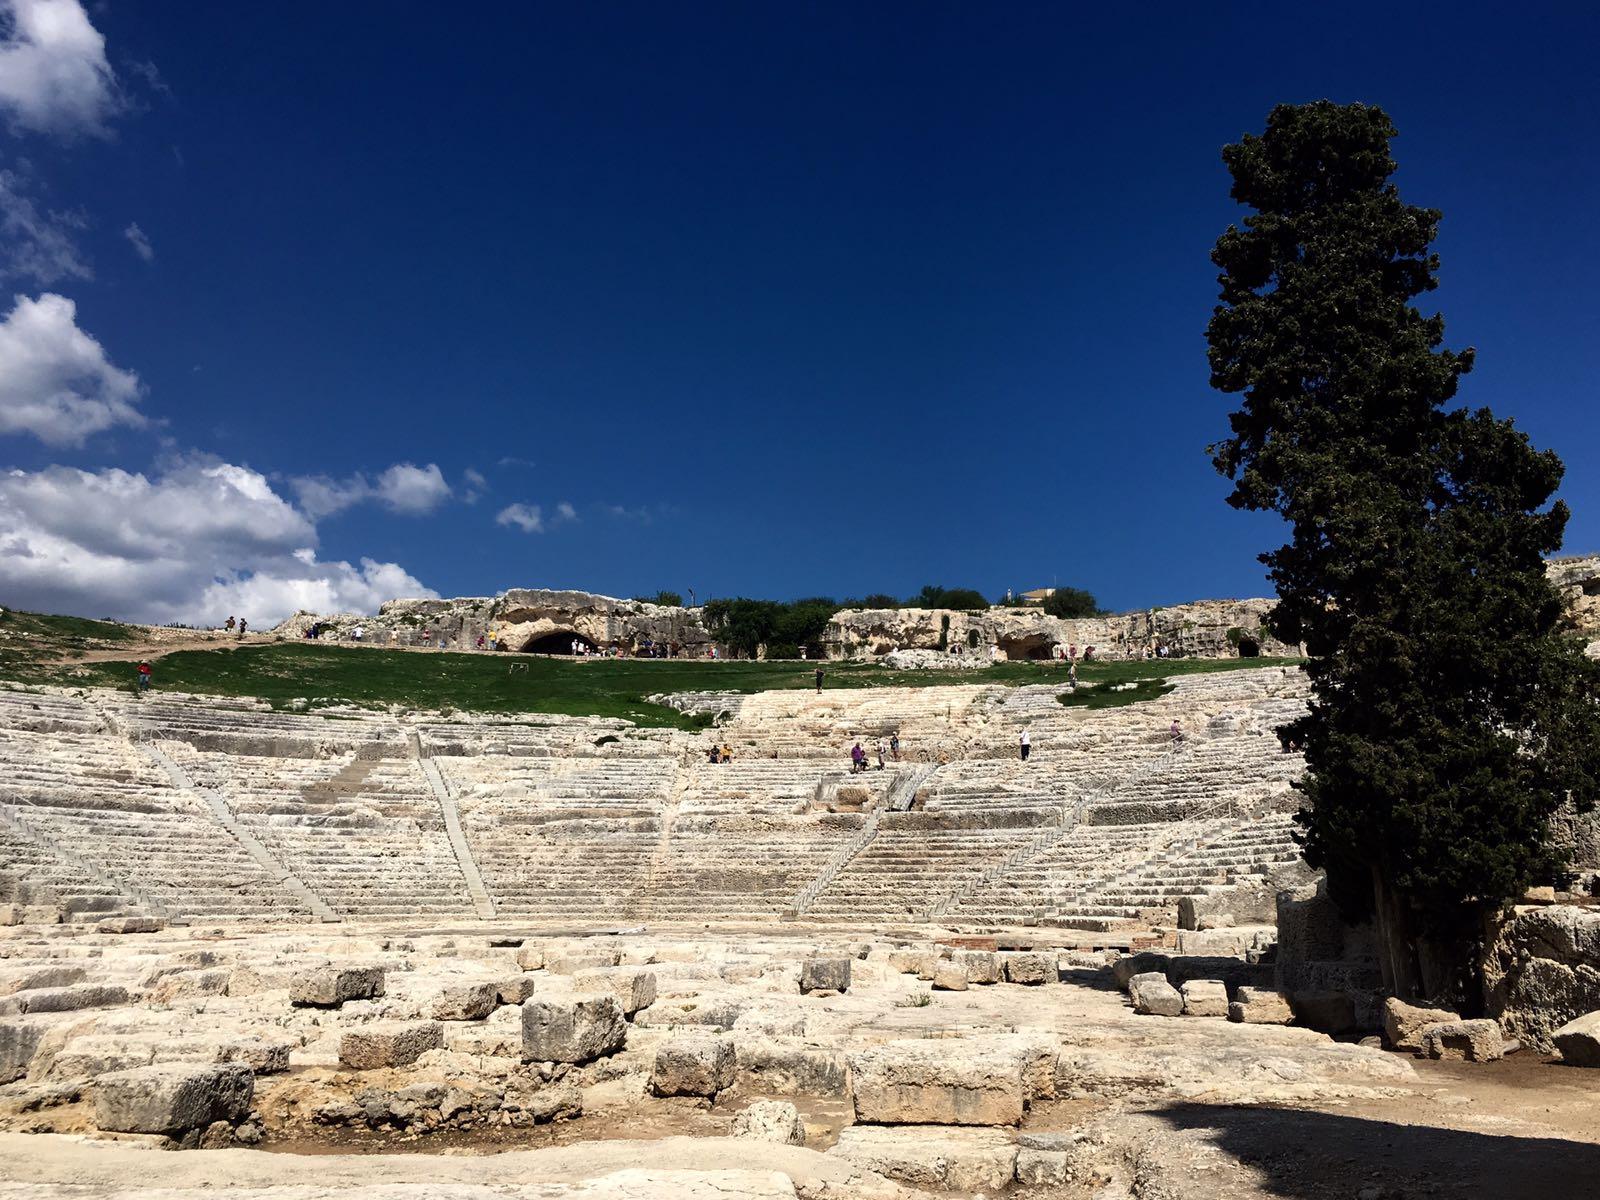 divadlo v syrakuzach na sicilii